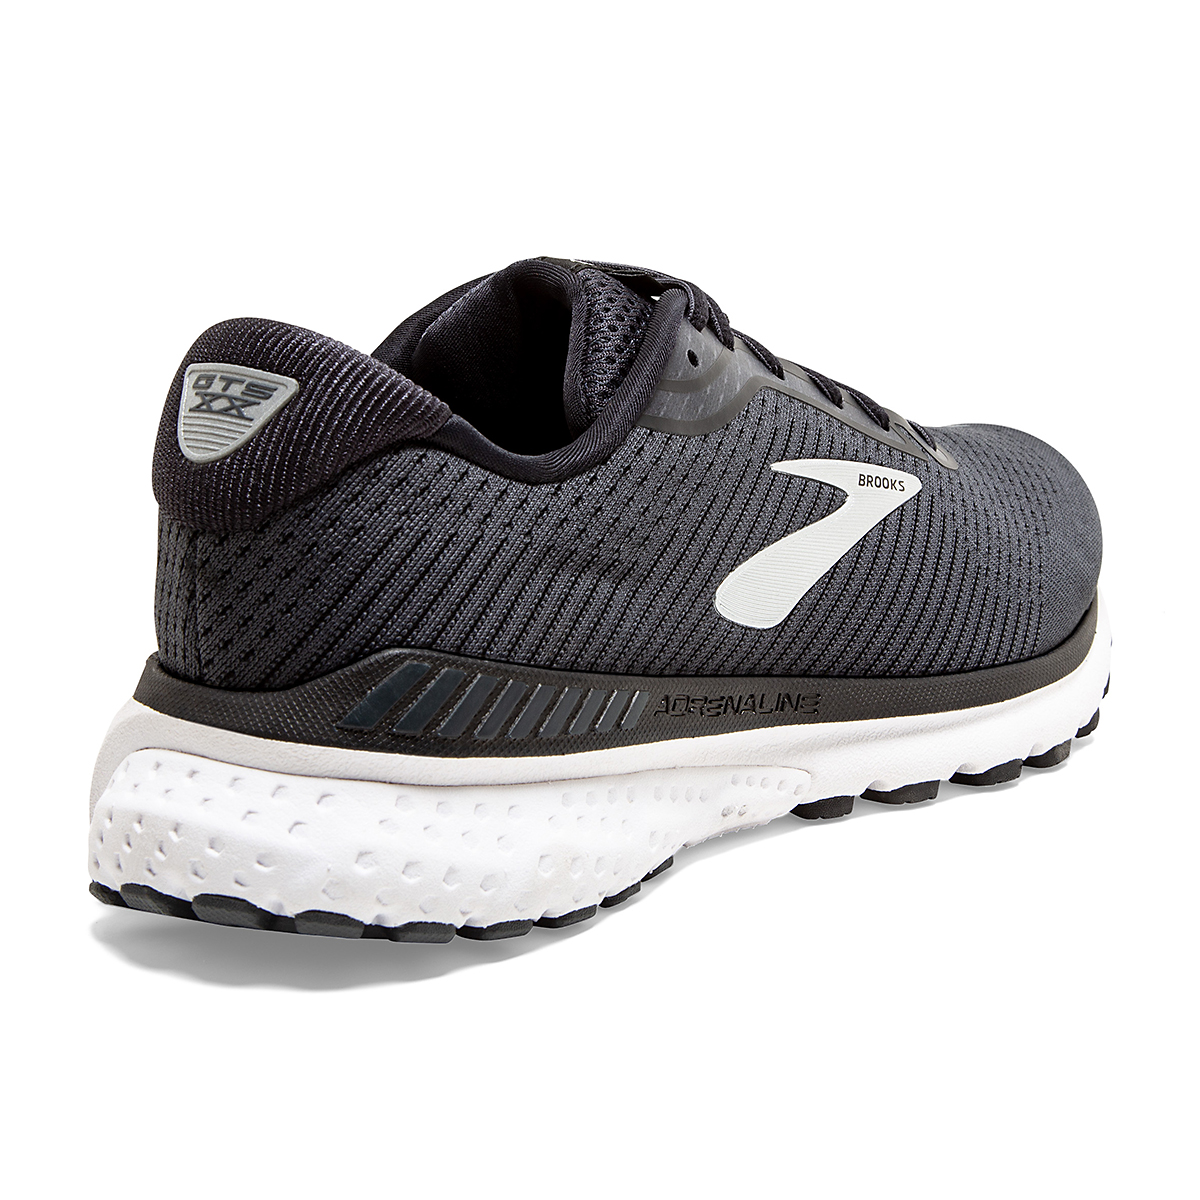 Men's Brooks Adrenaline GTS 20 Running Shoe - Color: Black/Grey/Ebony - Size: 7 - Width: Regular, Black/Grey/Ebony, large, image 4